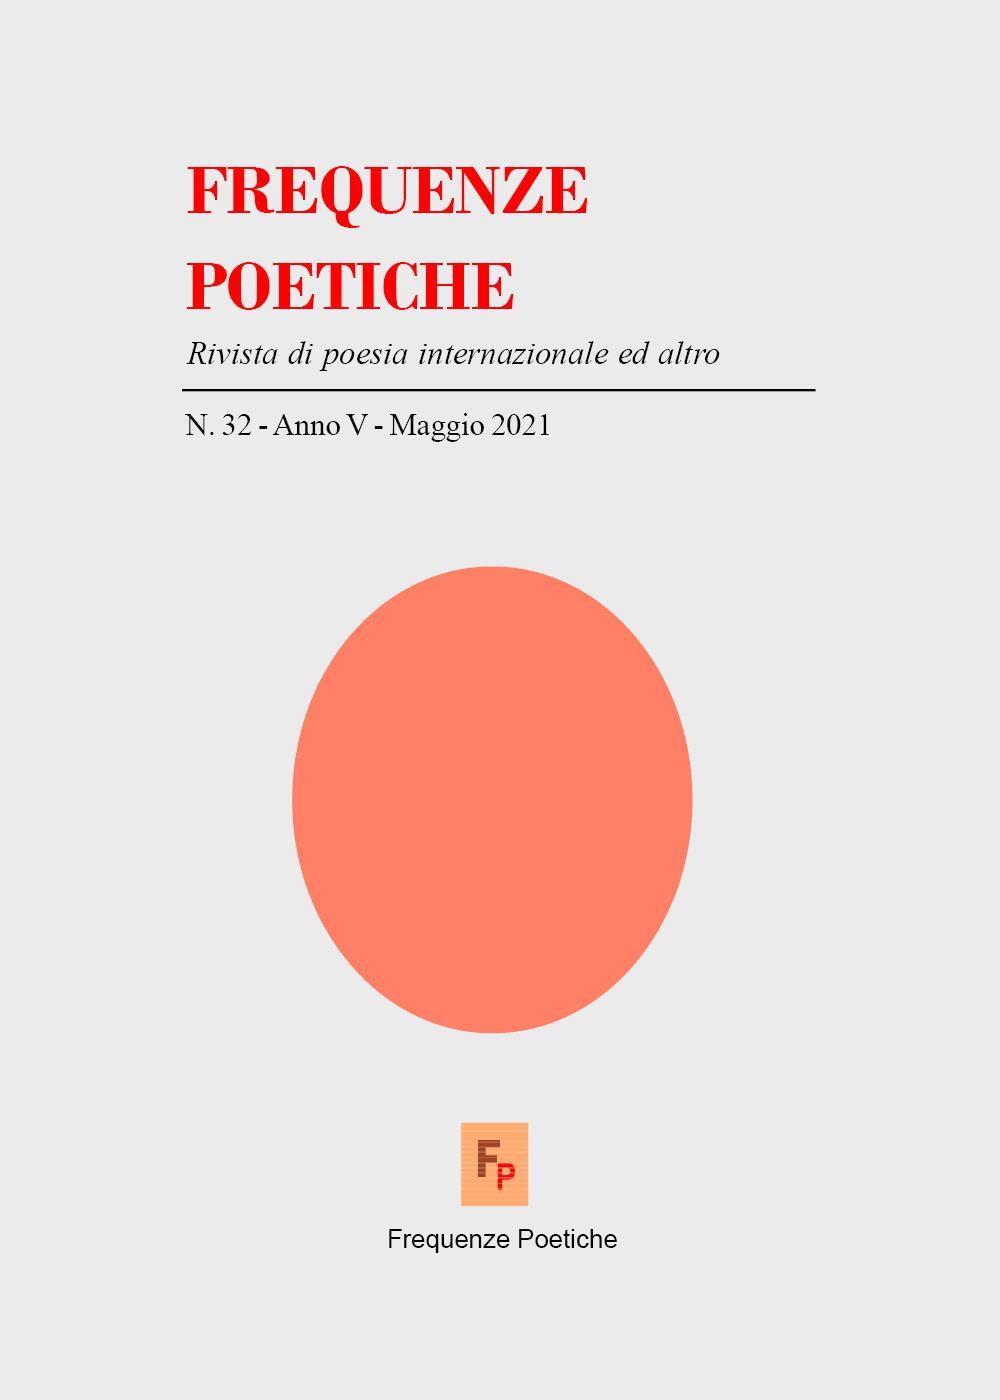 Frequenze Poetiche n. 32